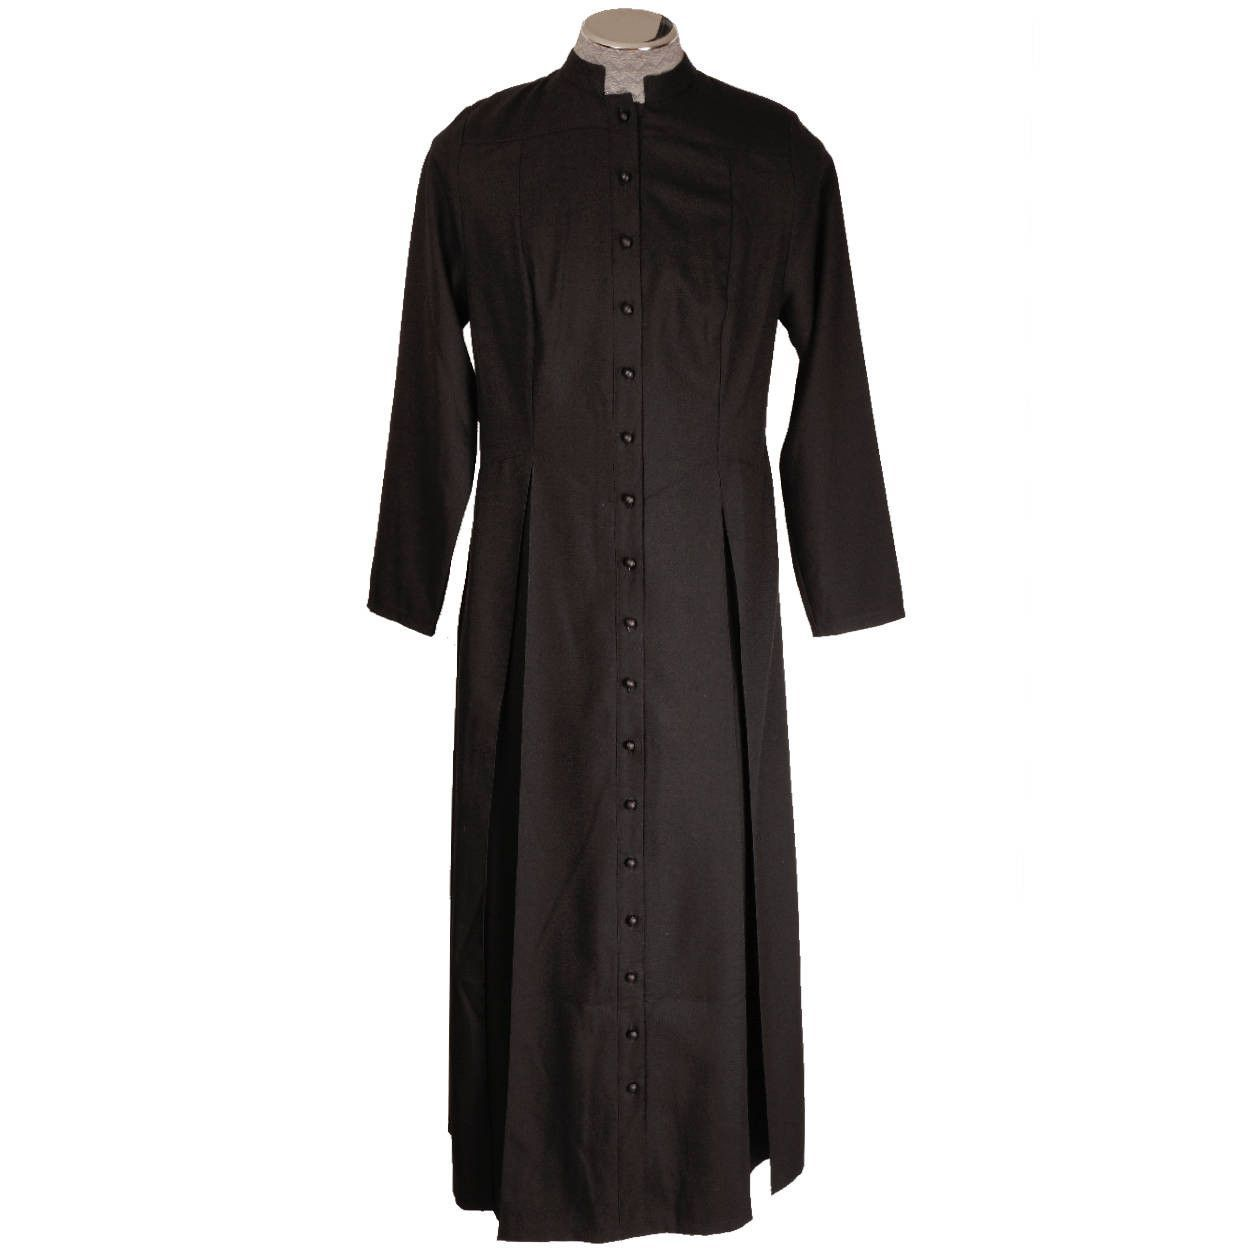 Vintage Roman Catholic Priest Cassock Soutane Black Robe Size M